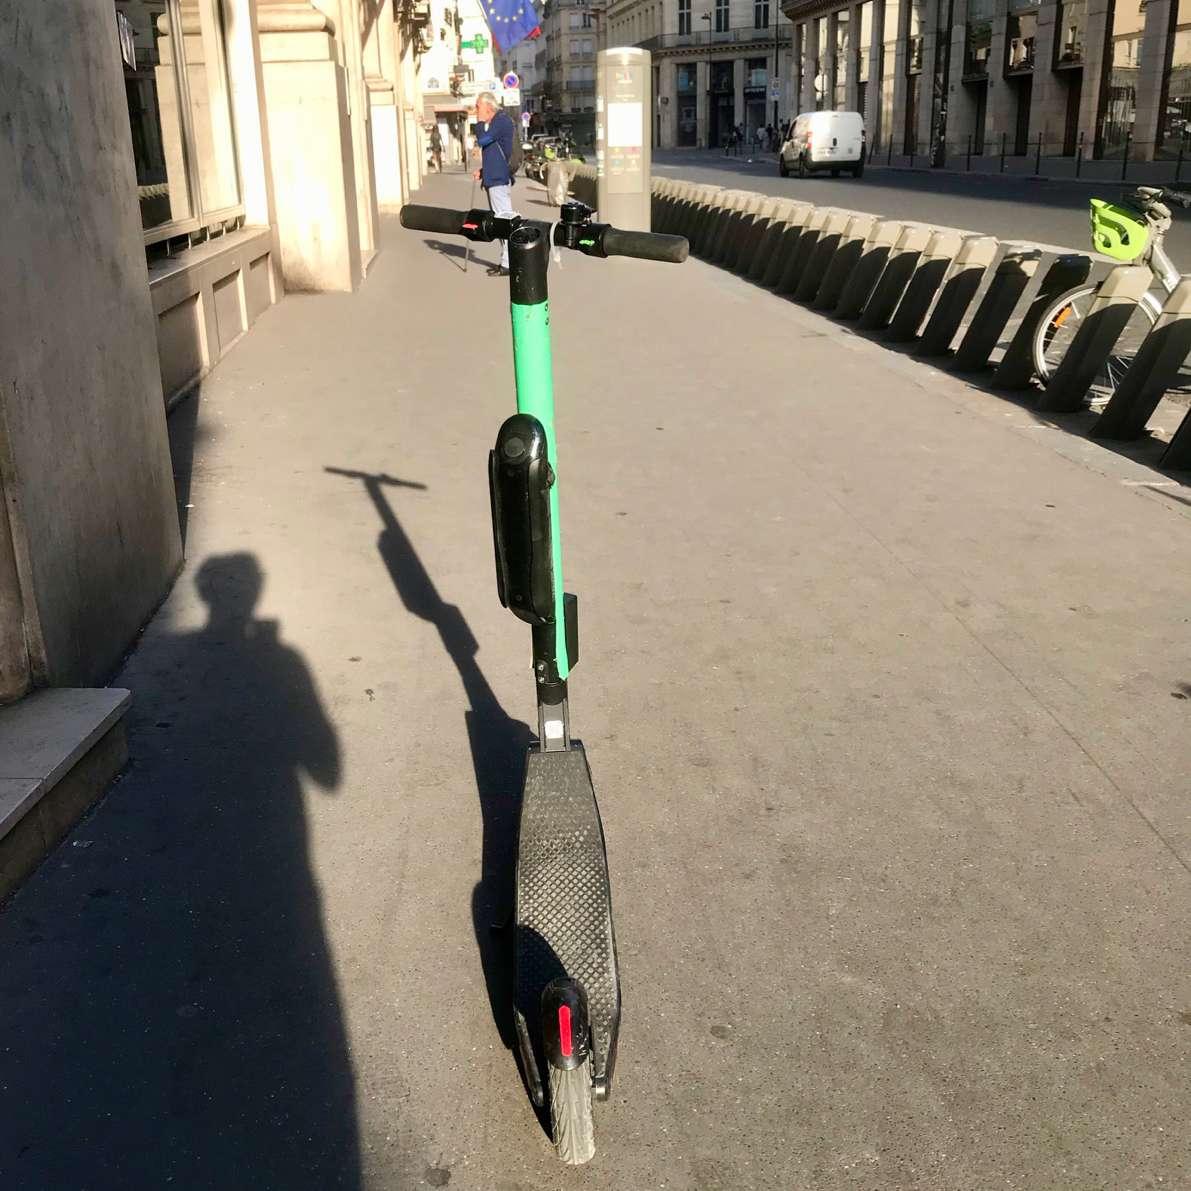 E-bike standing alone nest to empty Velib rack